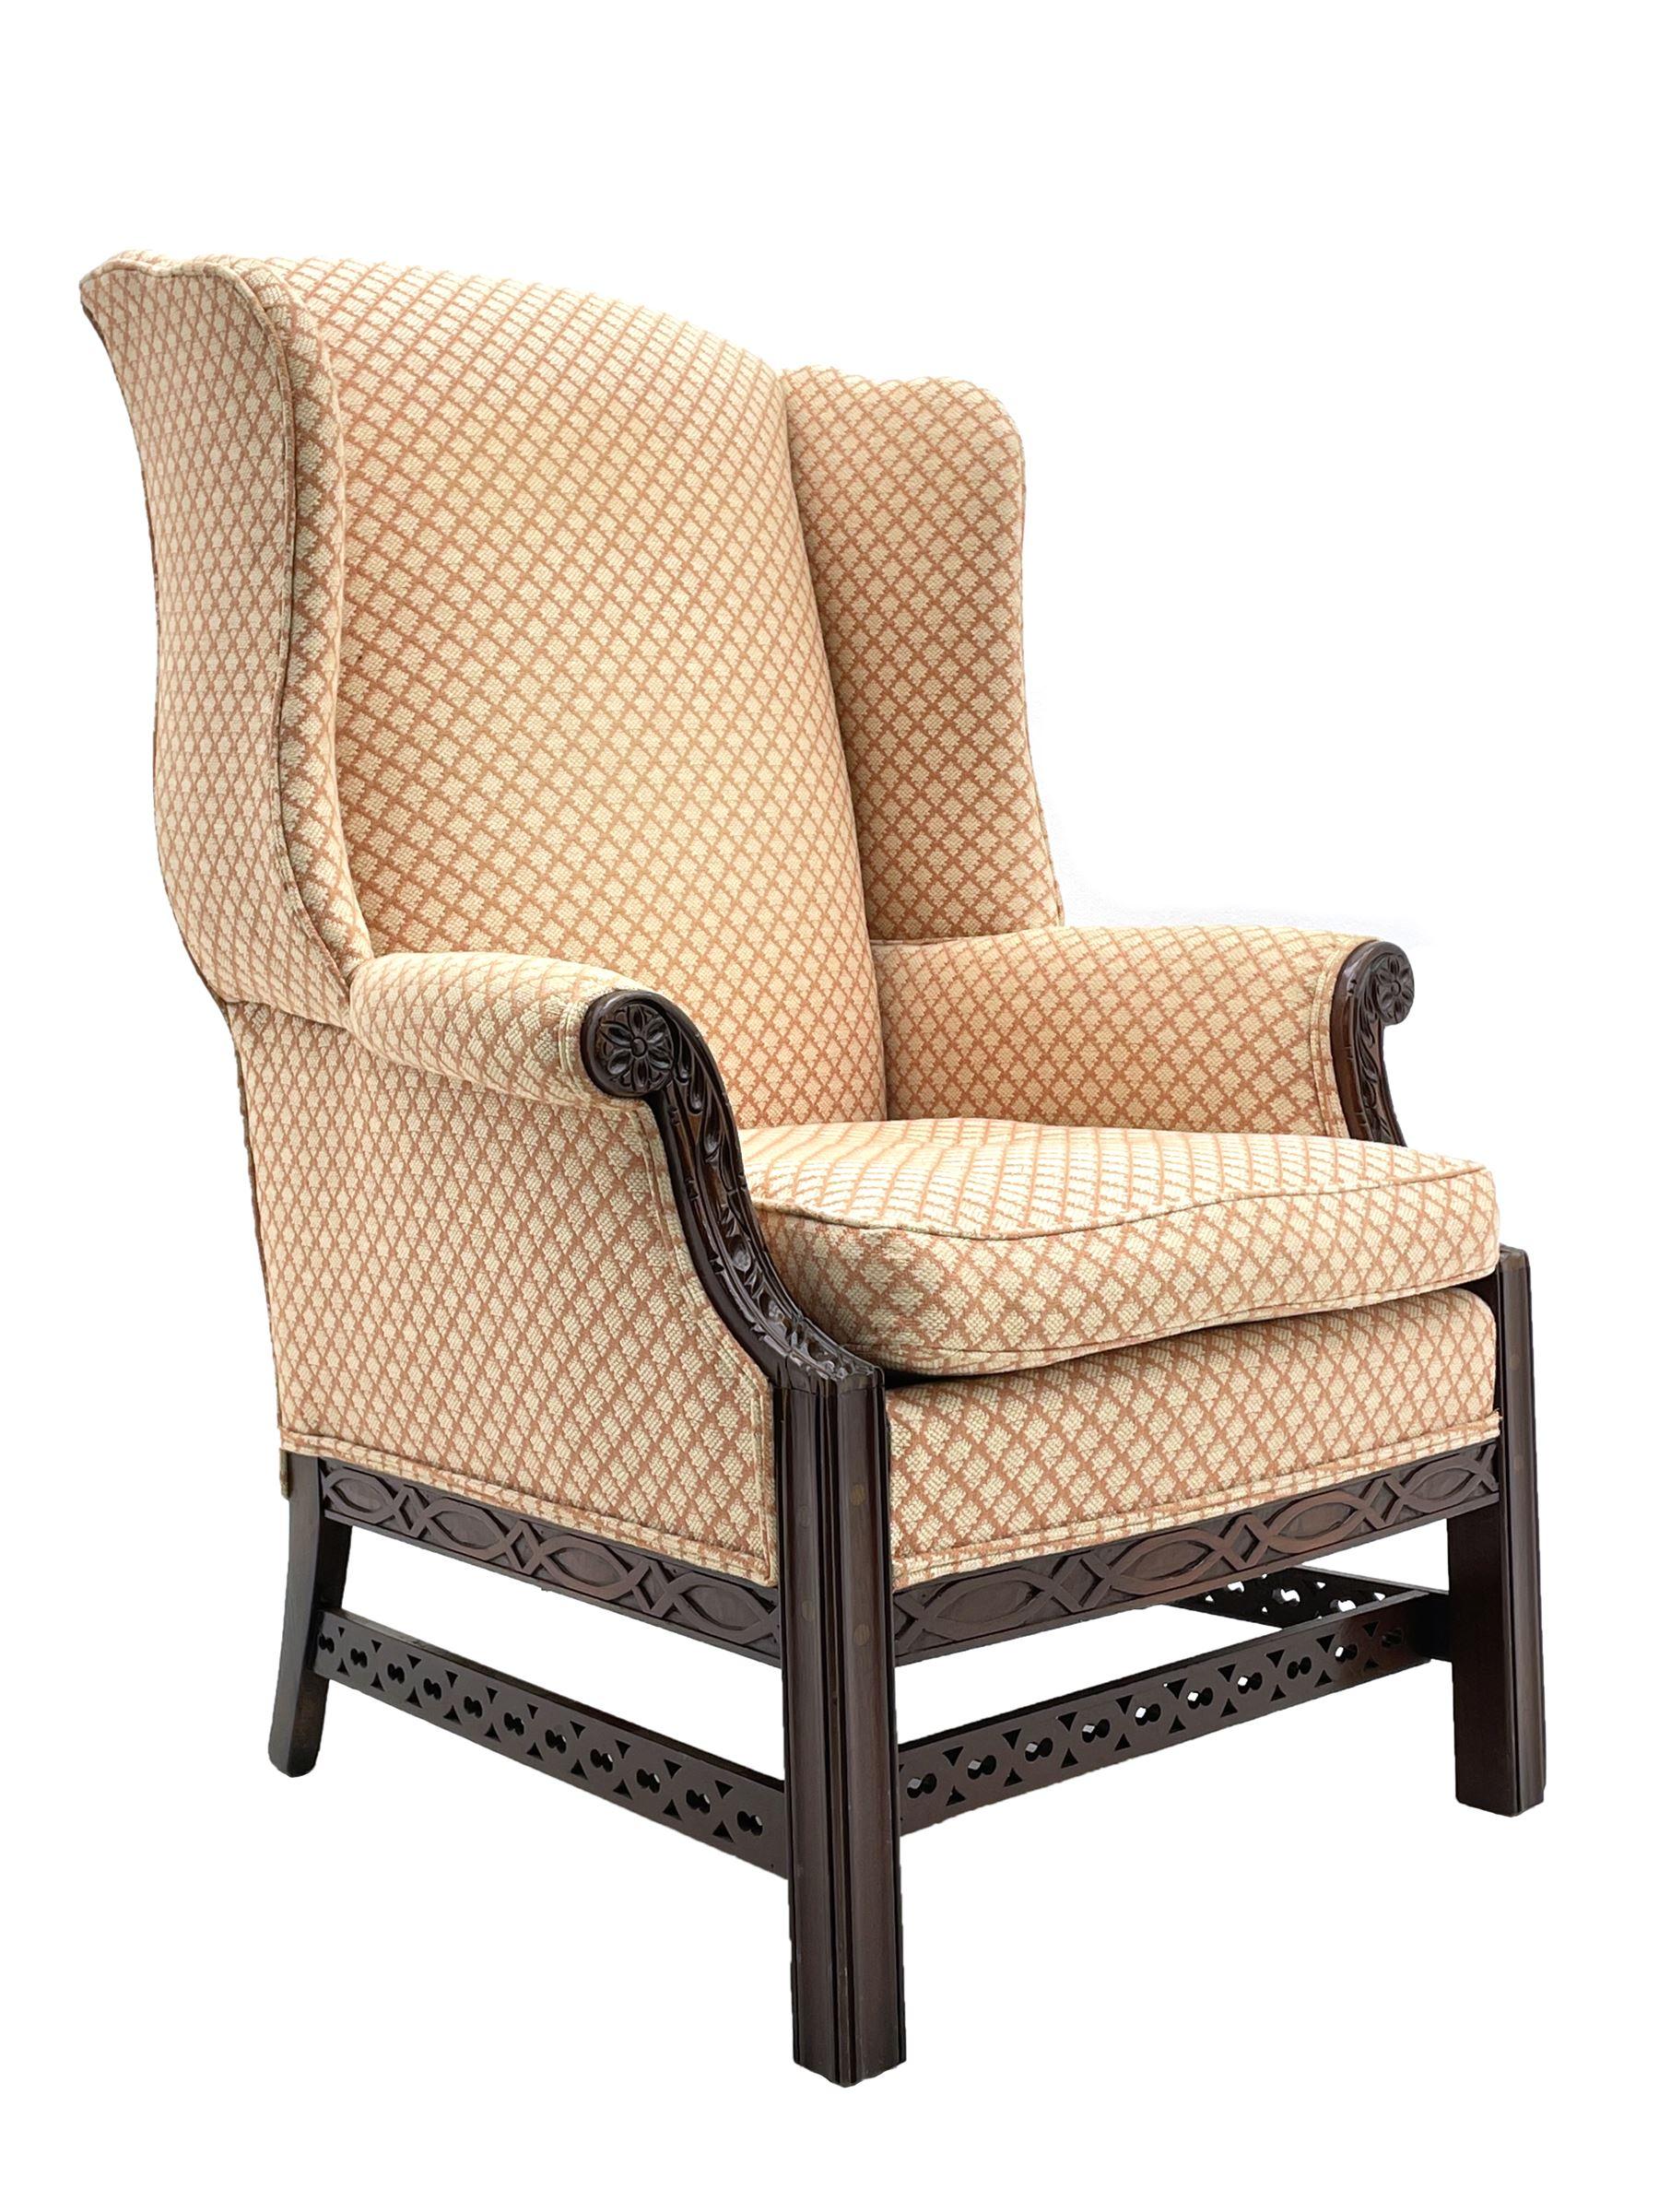 Georgian style mahogany framed wingback armchair